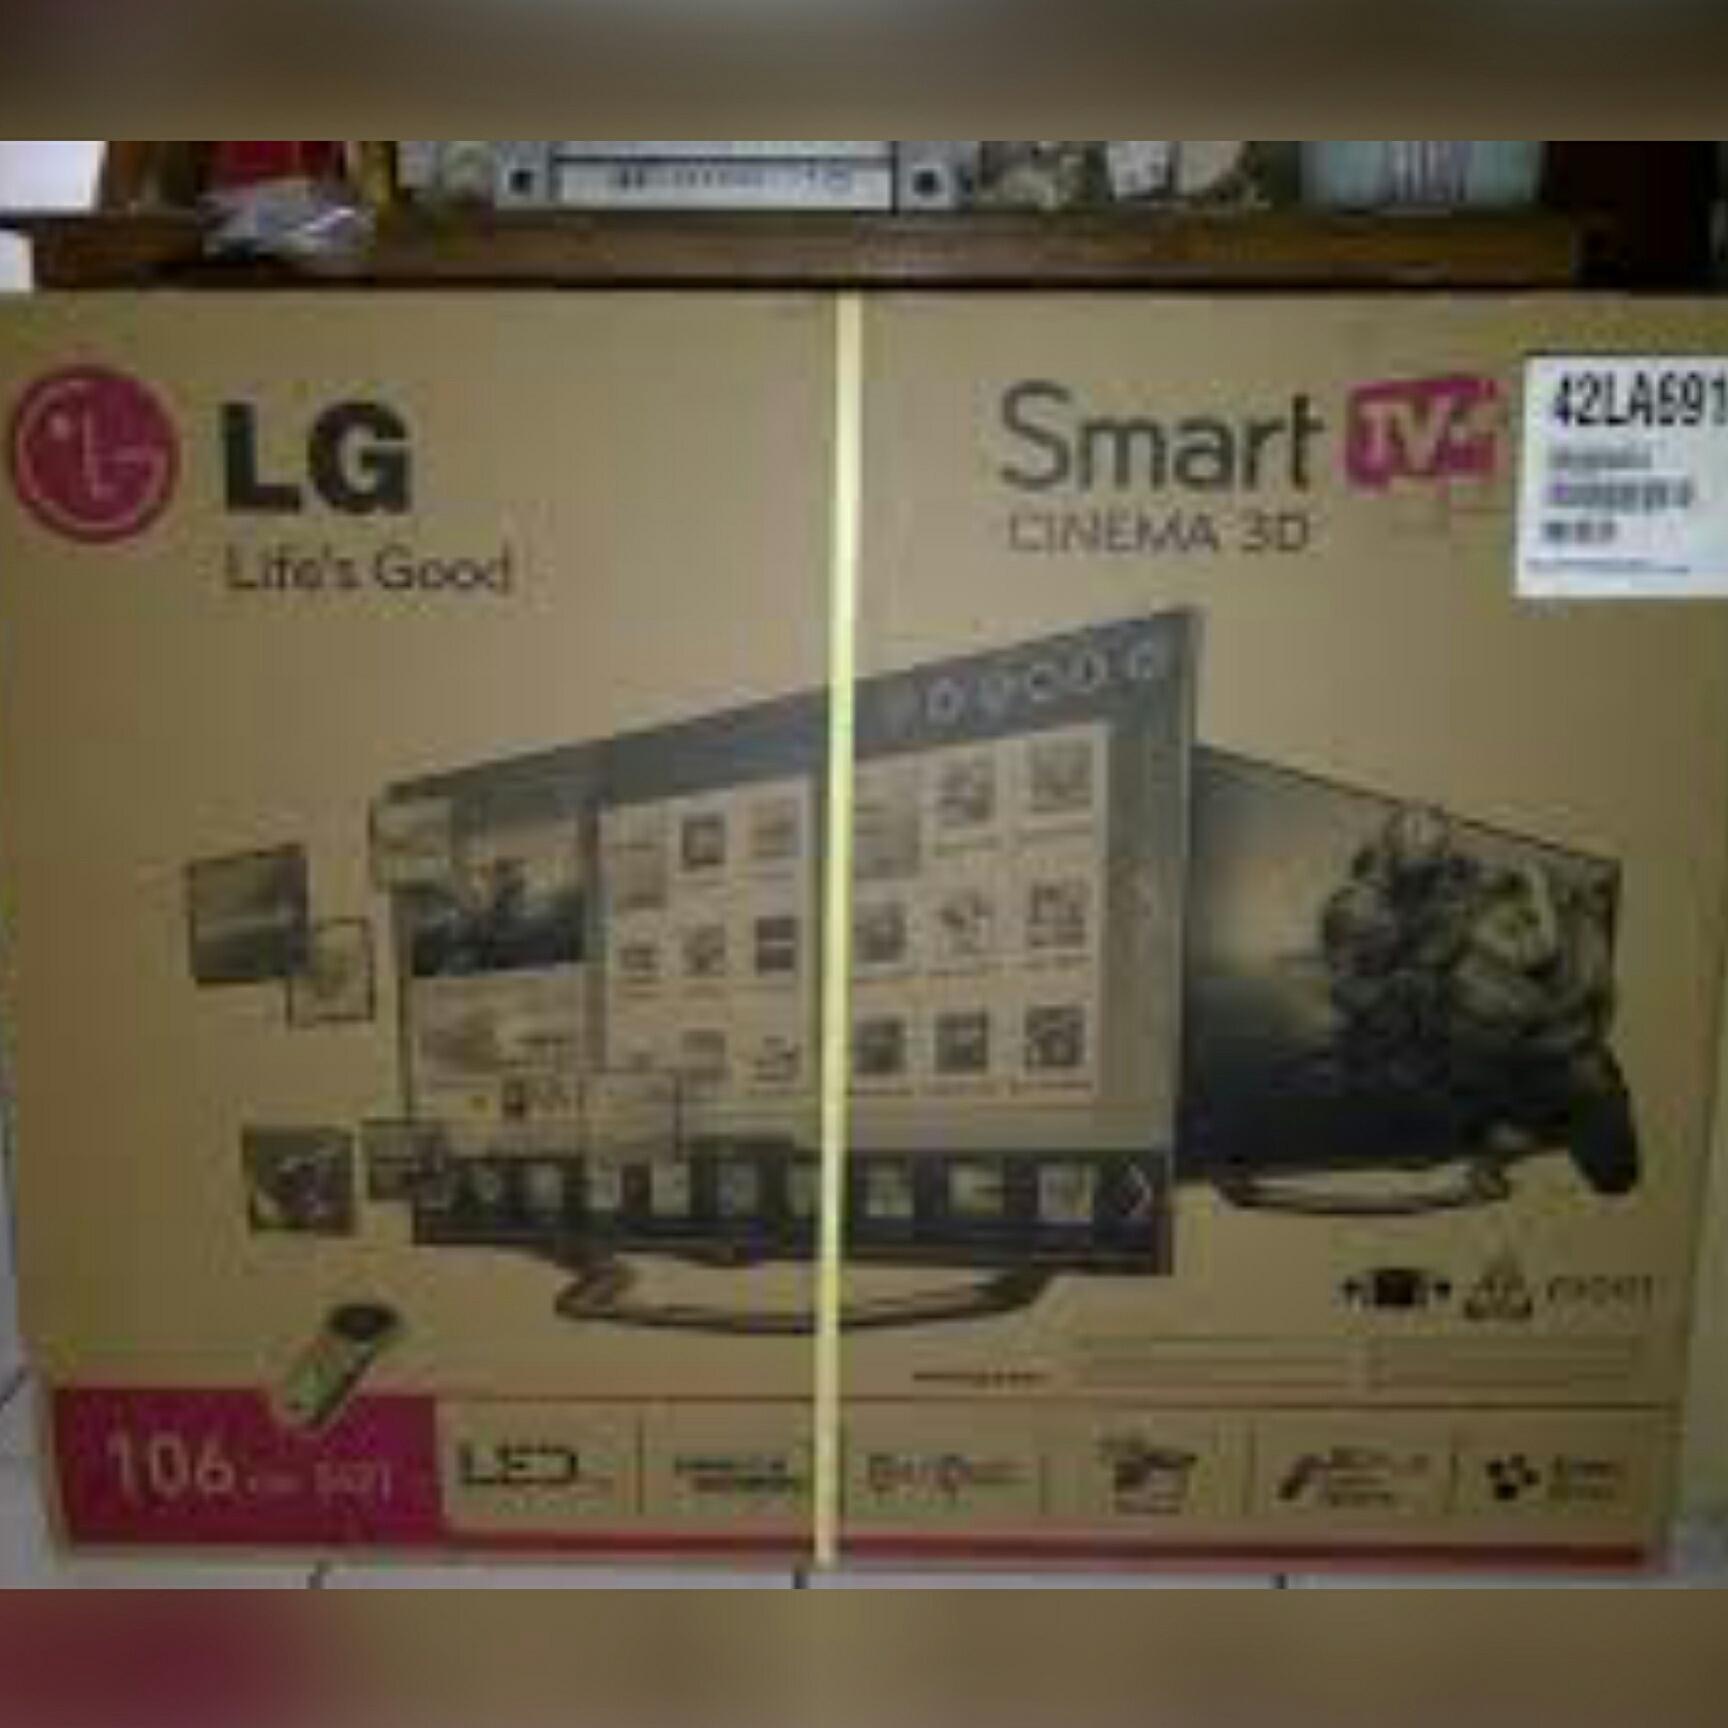 Fitur Hot Promo Driver Backlight Inverter Led 10 42 Inch 6fgsf5 Lampu Layar Panel Laptop Monitor Tv Ganti Lcd Ccfl Neon Sampai 17 380 Mm 4014 X 63 Ca 166 Isi 3 Lg Asli Original